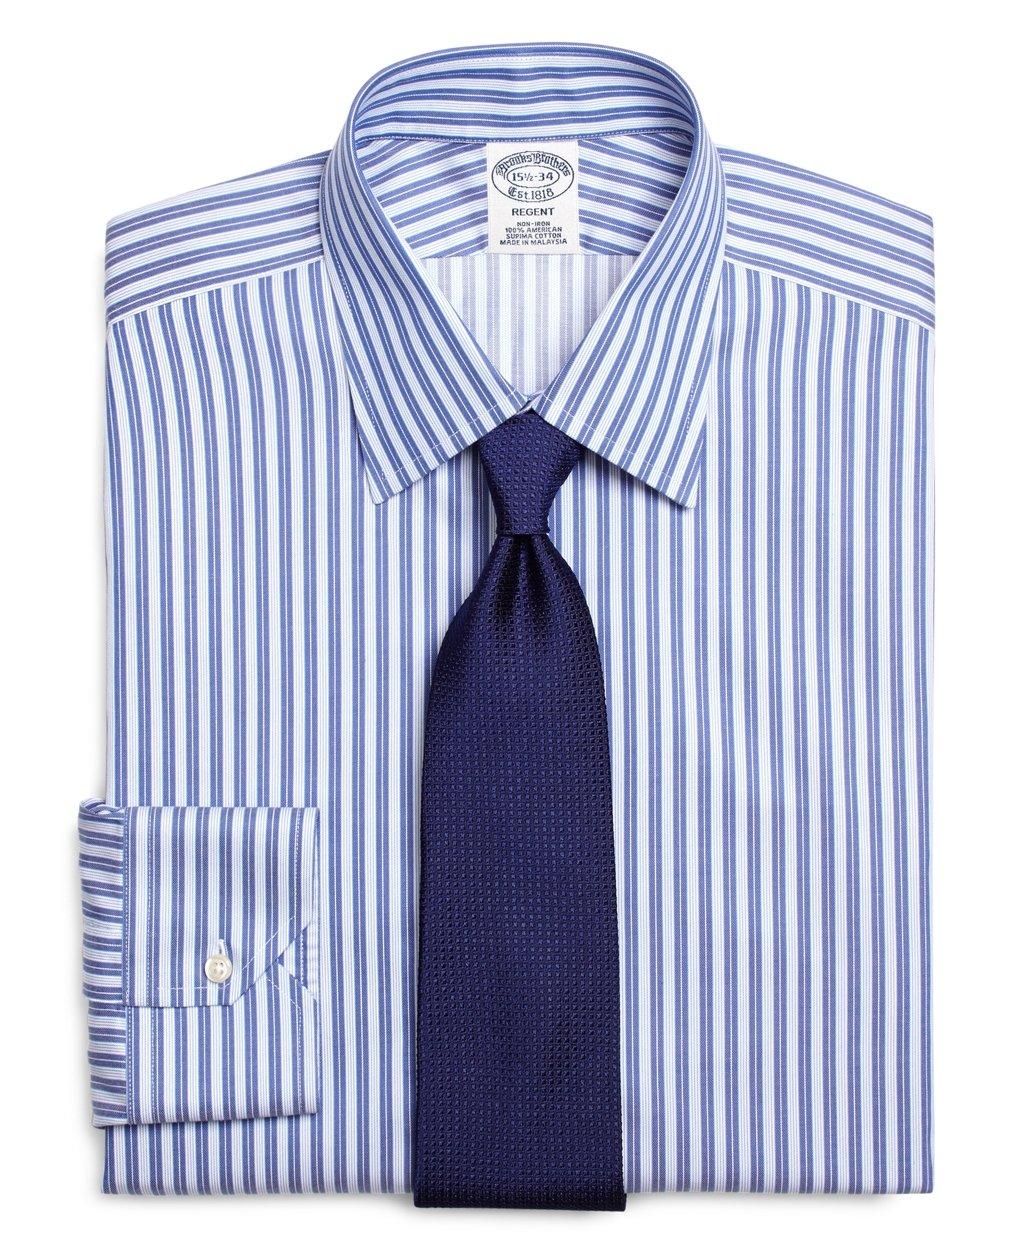 Brooks brothers non iron milano fit bb 10 stripe dress for Brooks brothers non iron shirts review